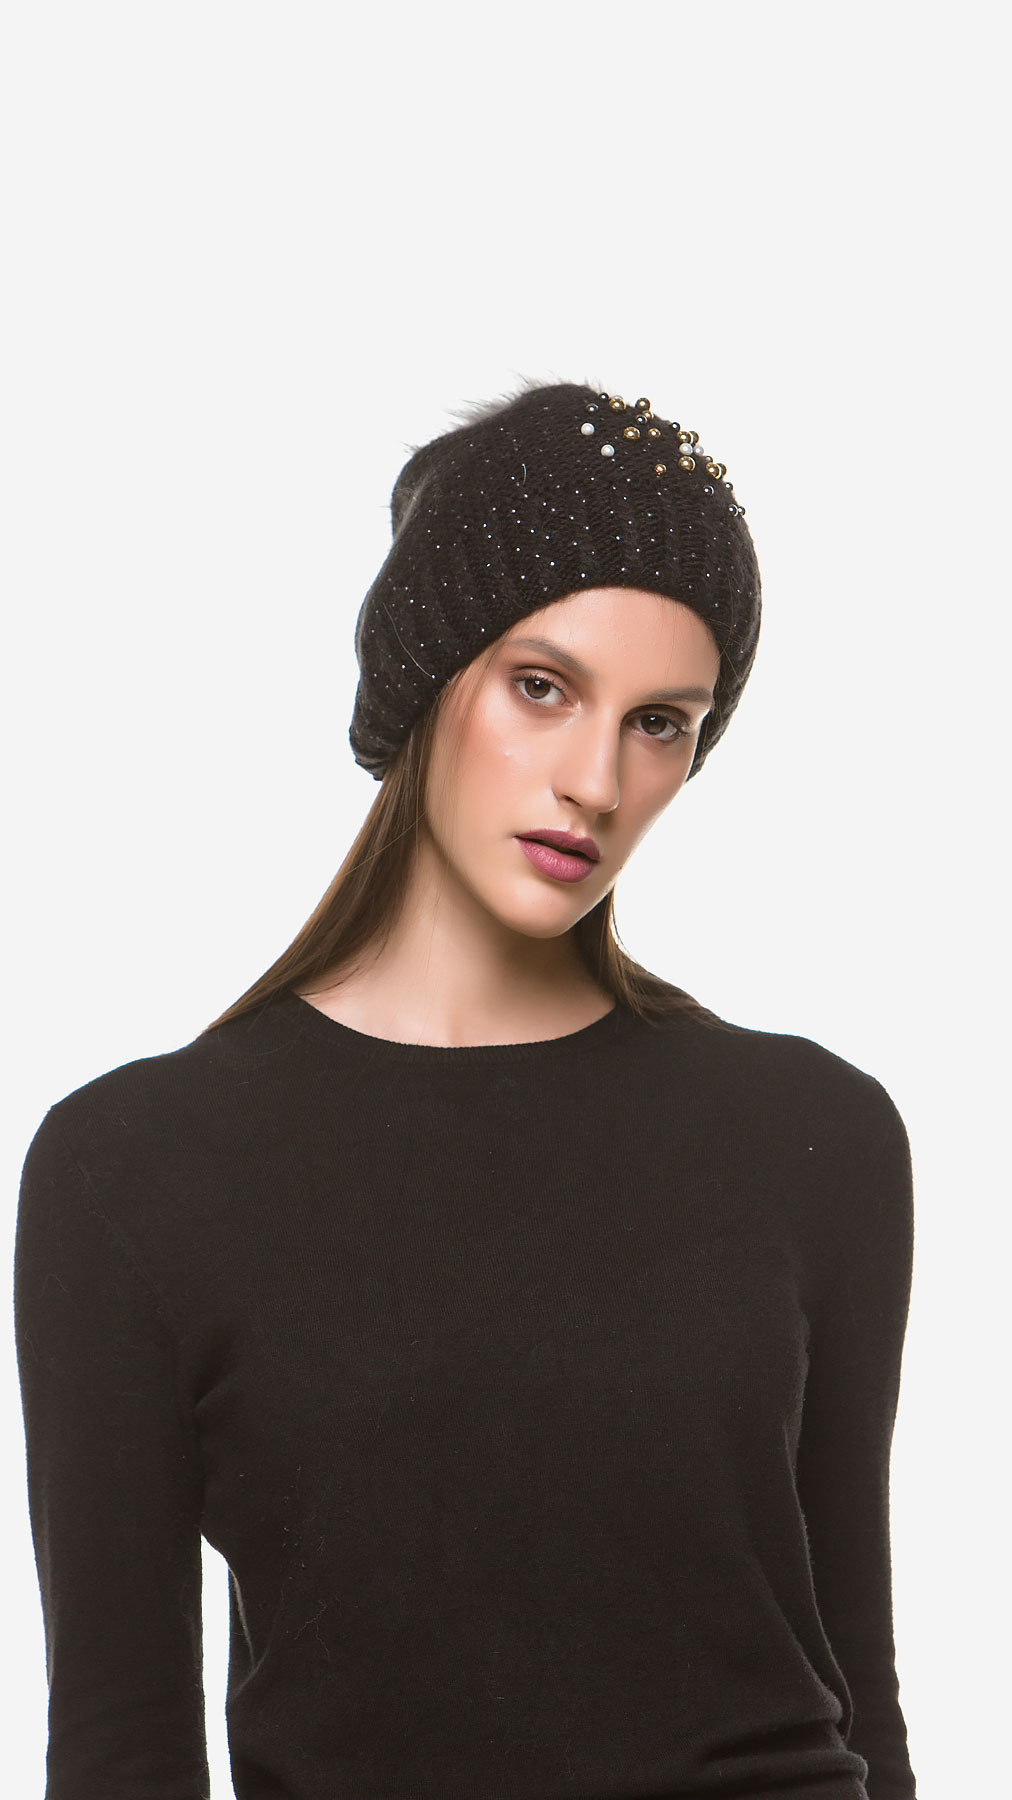 POM POM HAT - Muse Furs 16d0dba70d9